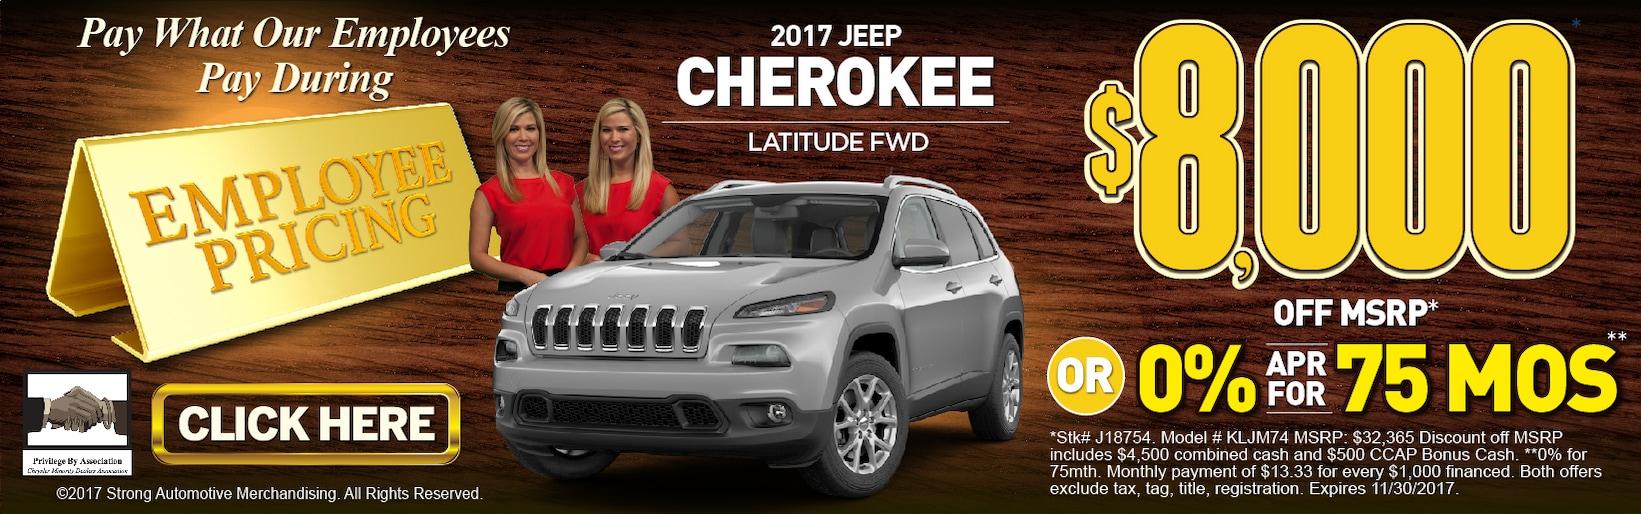 Tyson Motor Corporation New Chrysler Dodge Jeep Ram